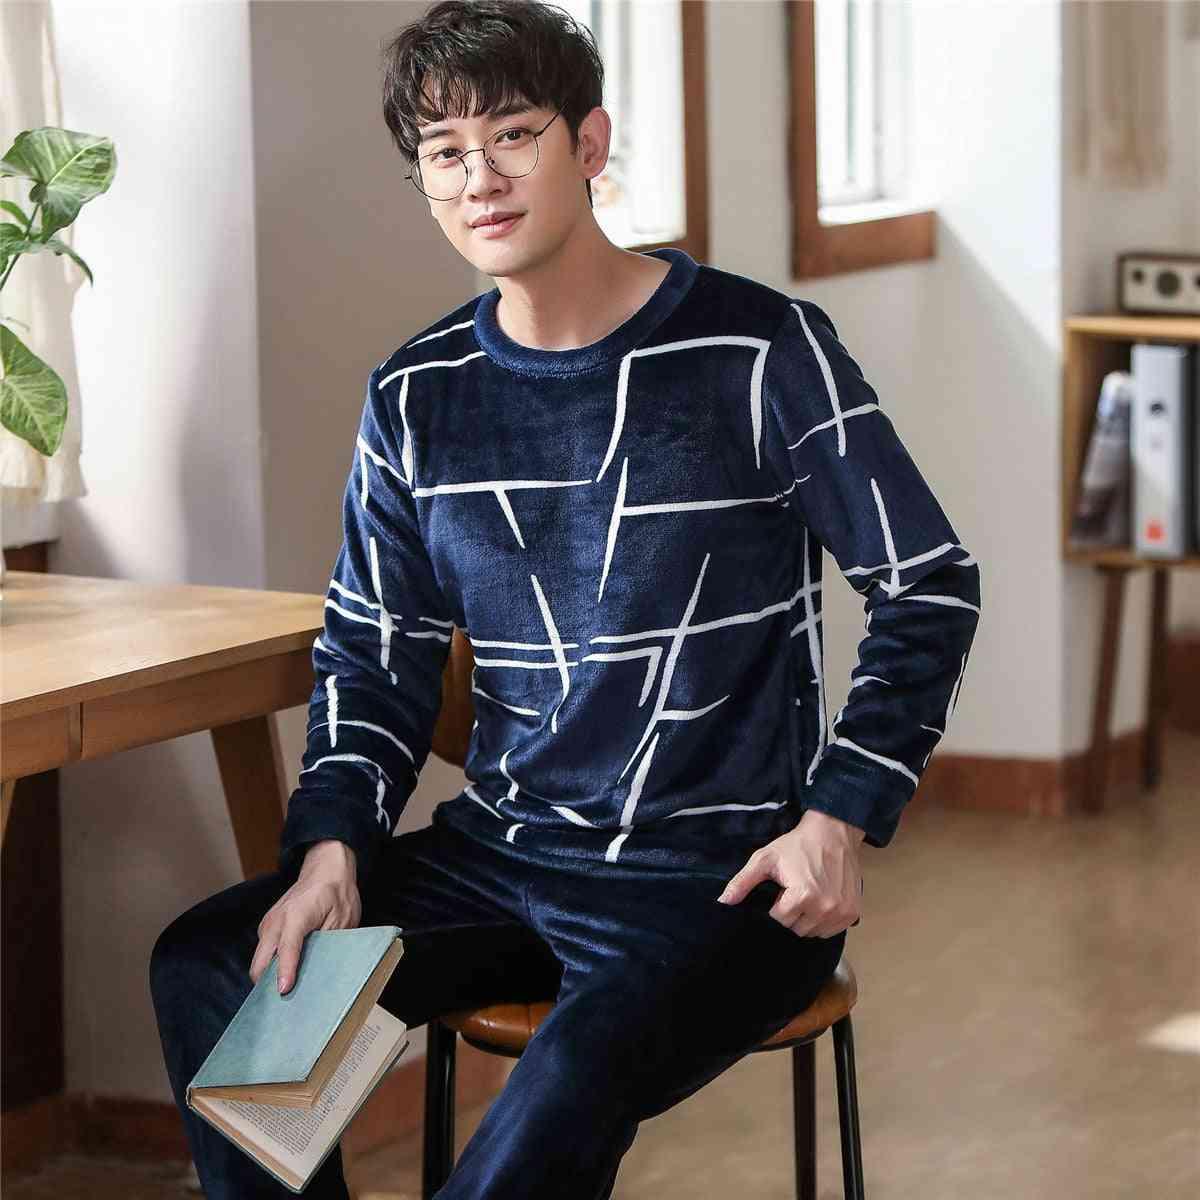 Winter Thicken Warm Soft Flannel Long-sleeve Sleepwear Pajamas